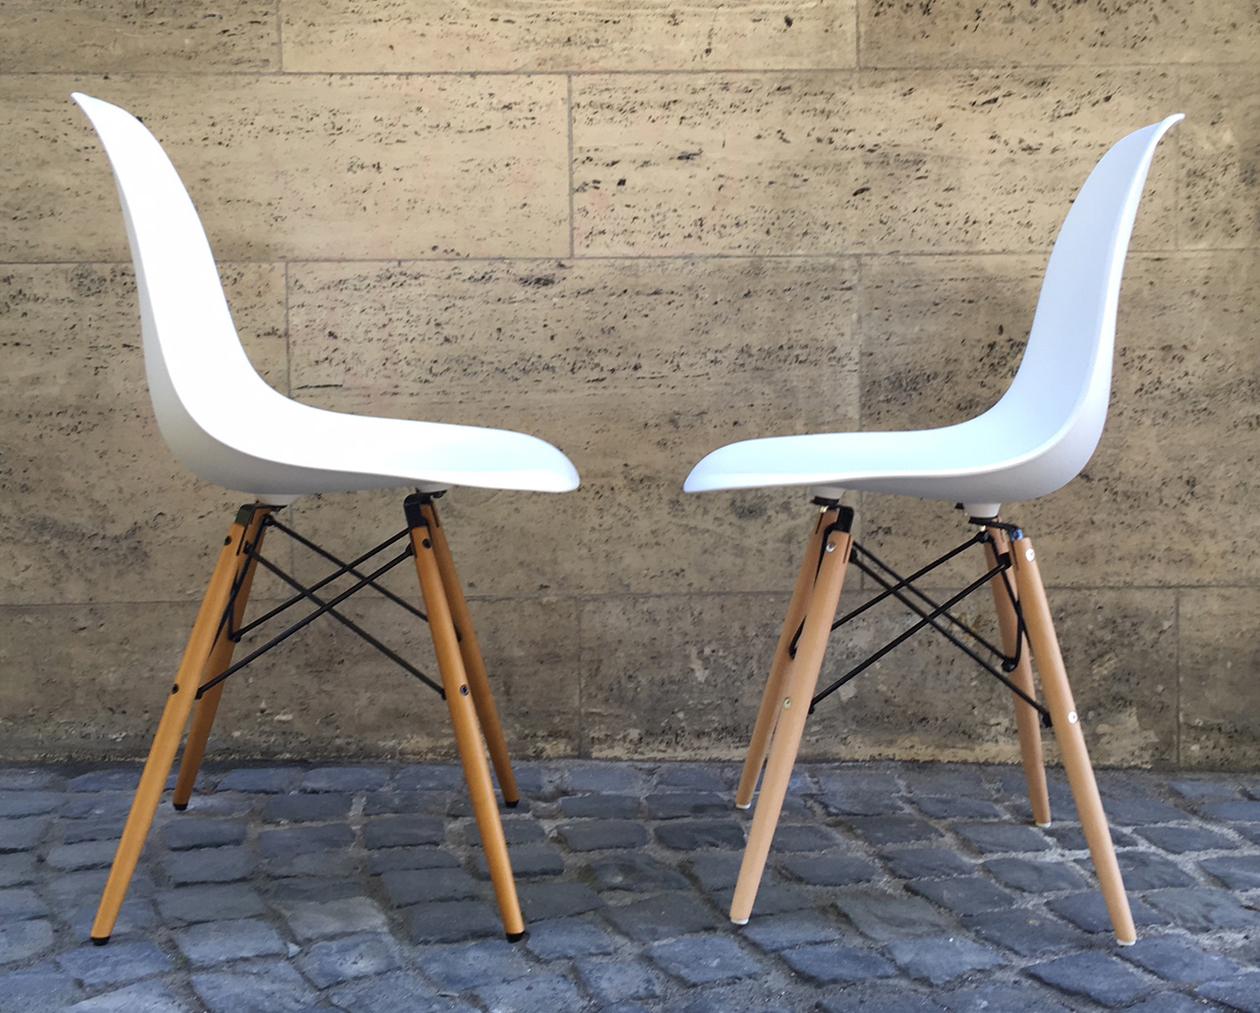 Original Und Falschung Der Eames Plastic Chair Markanto